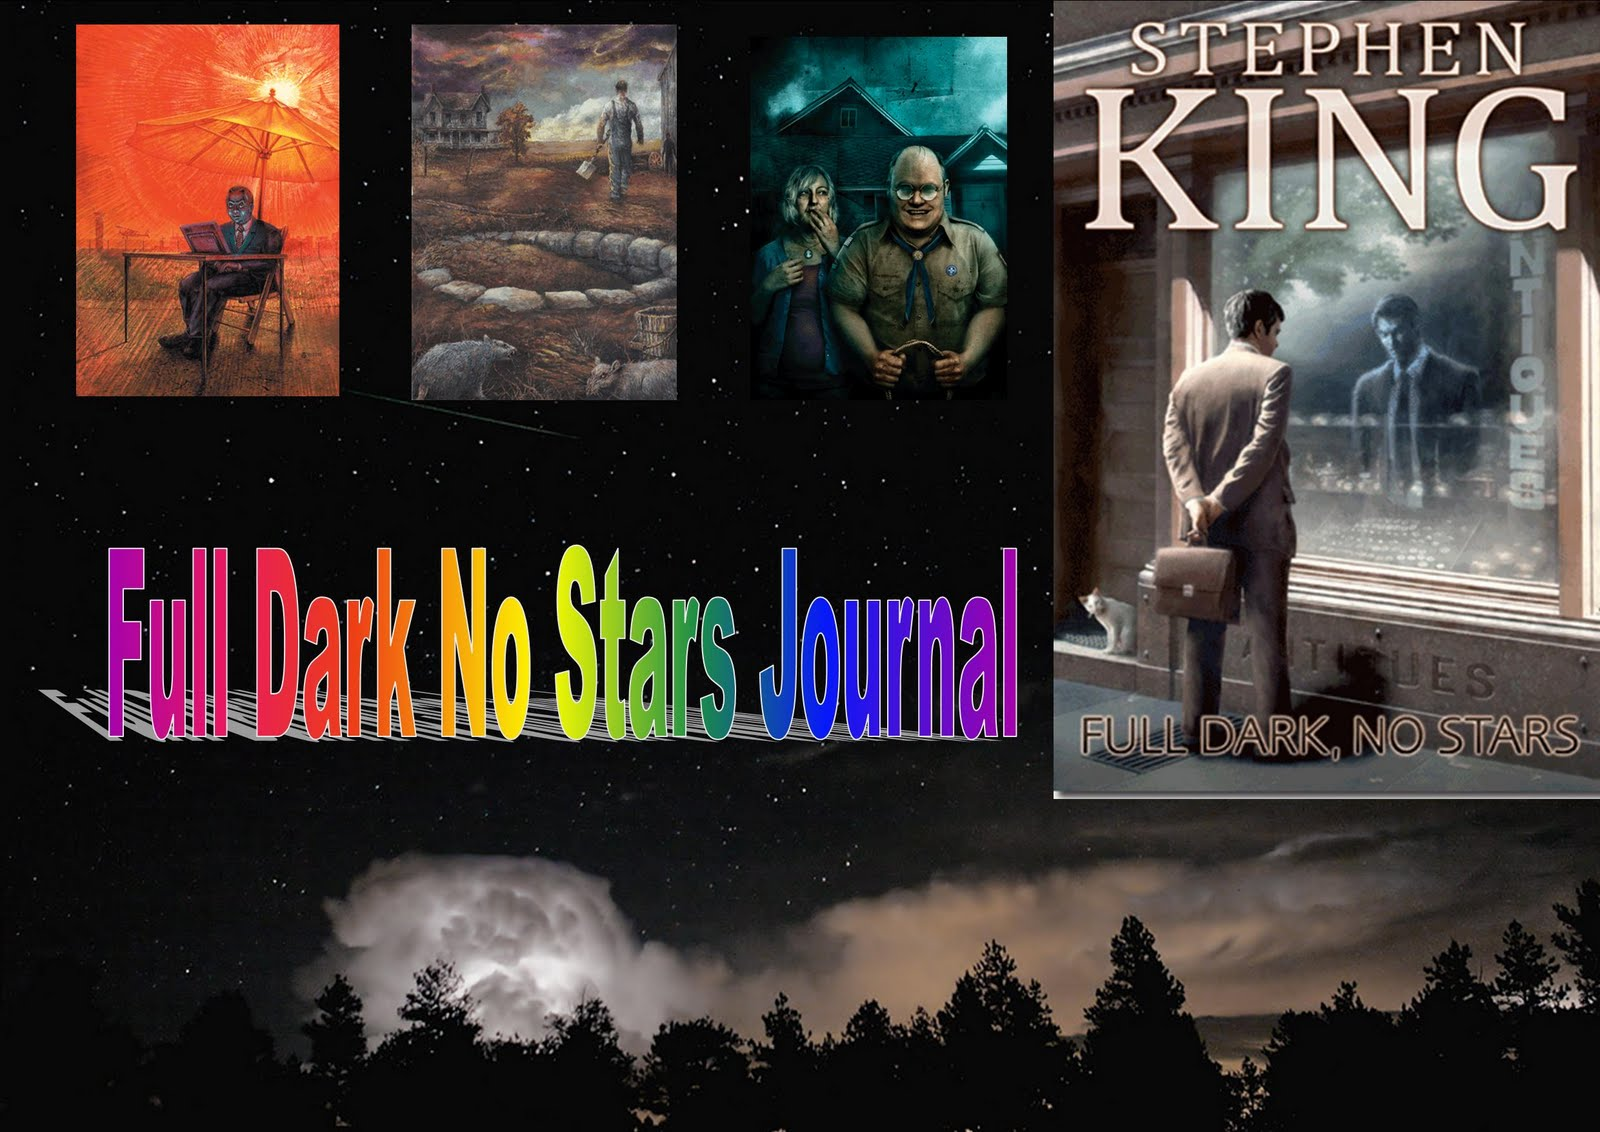 Stephen King Full Dark no Stars Copy of Full Dark no Stars